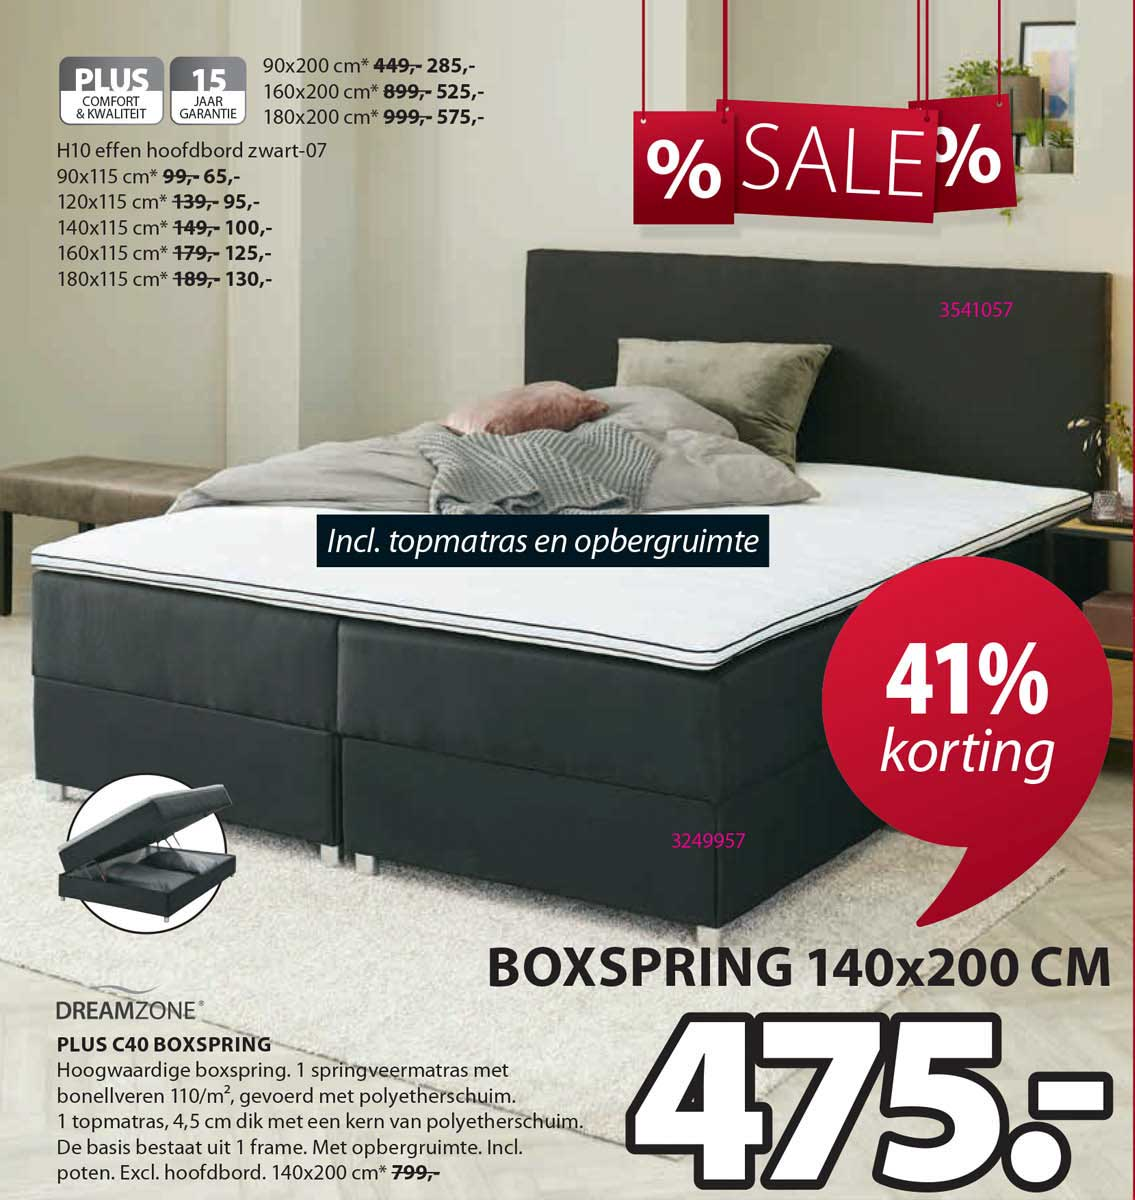 Jysk Dreamzone Plus C40 Boxspring 41% Korting